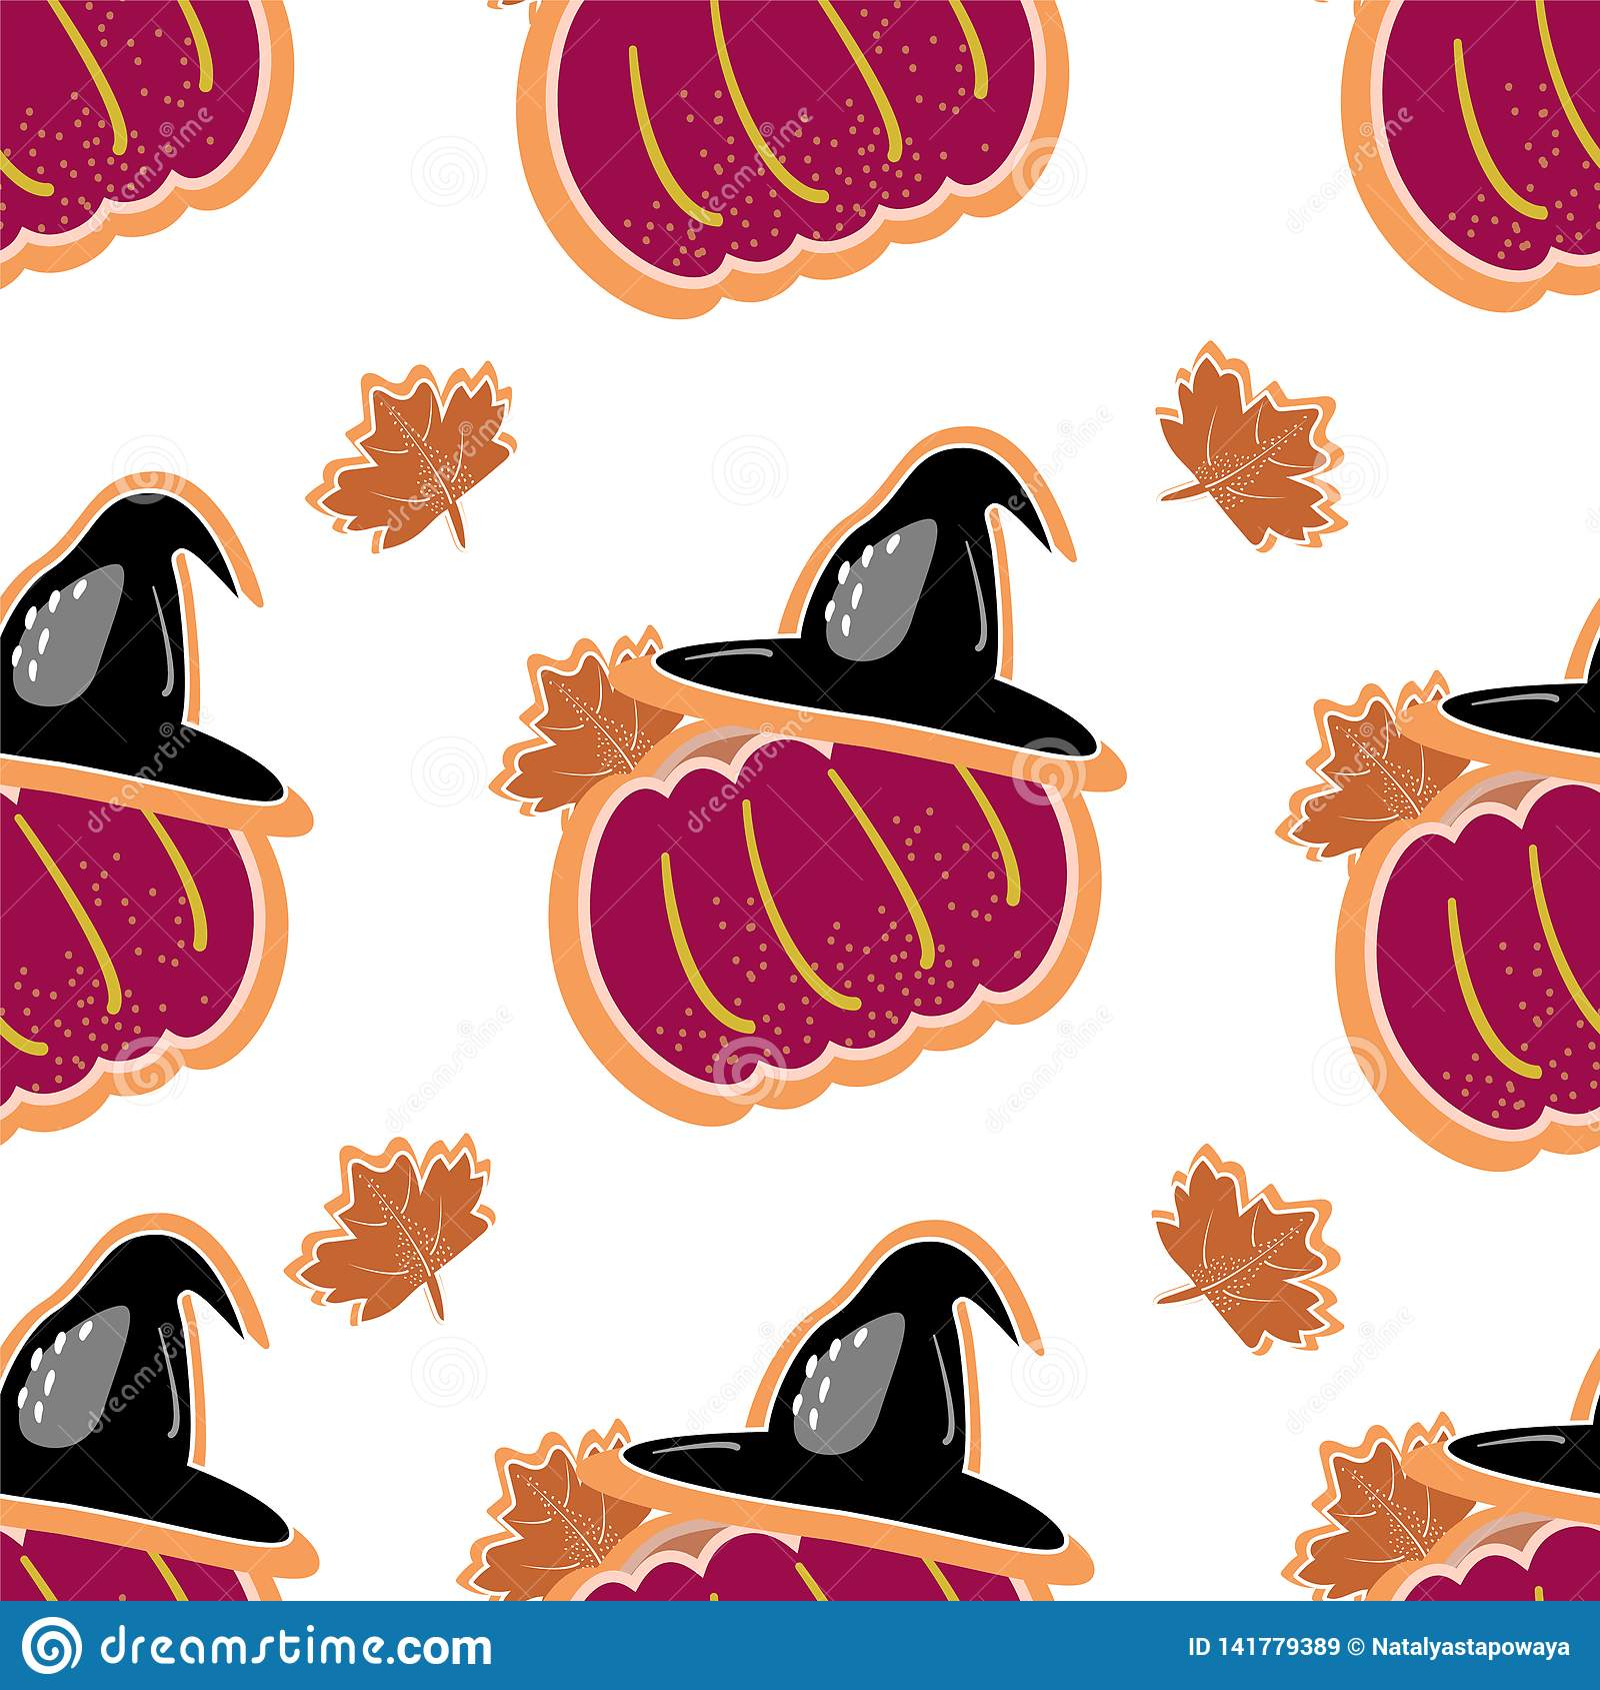 Halloween Seamless Pattern Background With Pumpkin, Bat